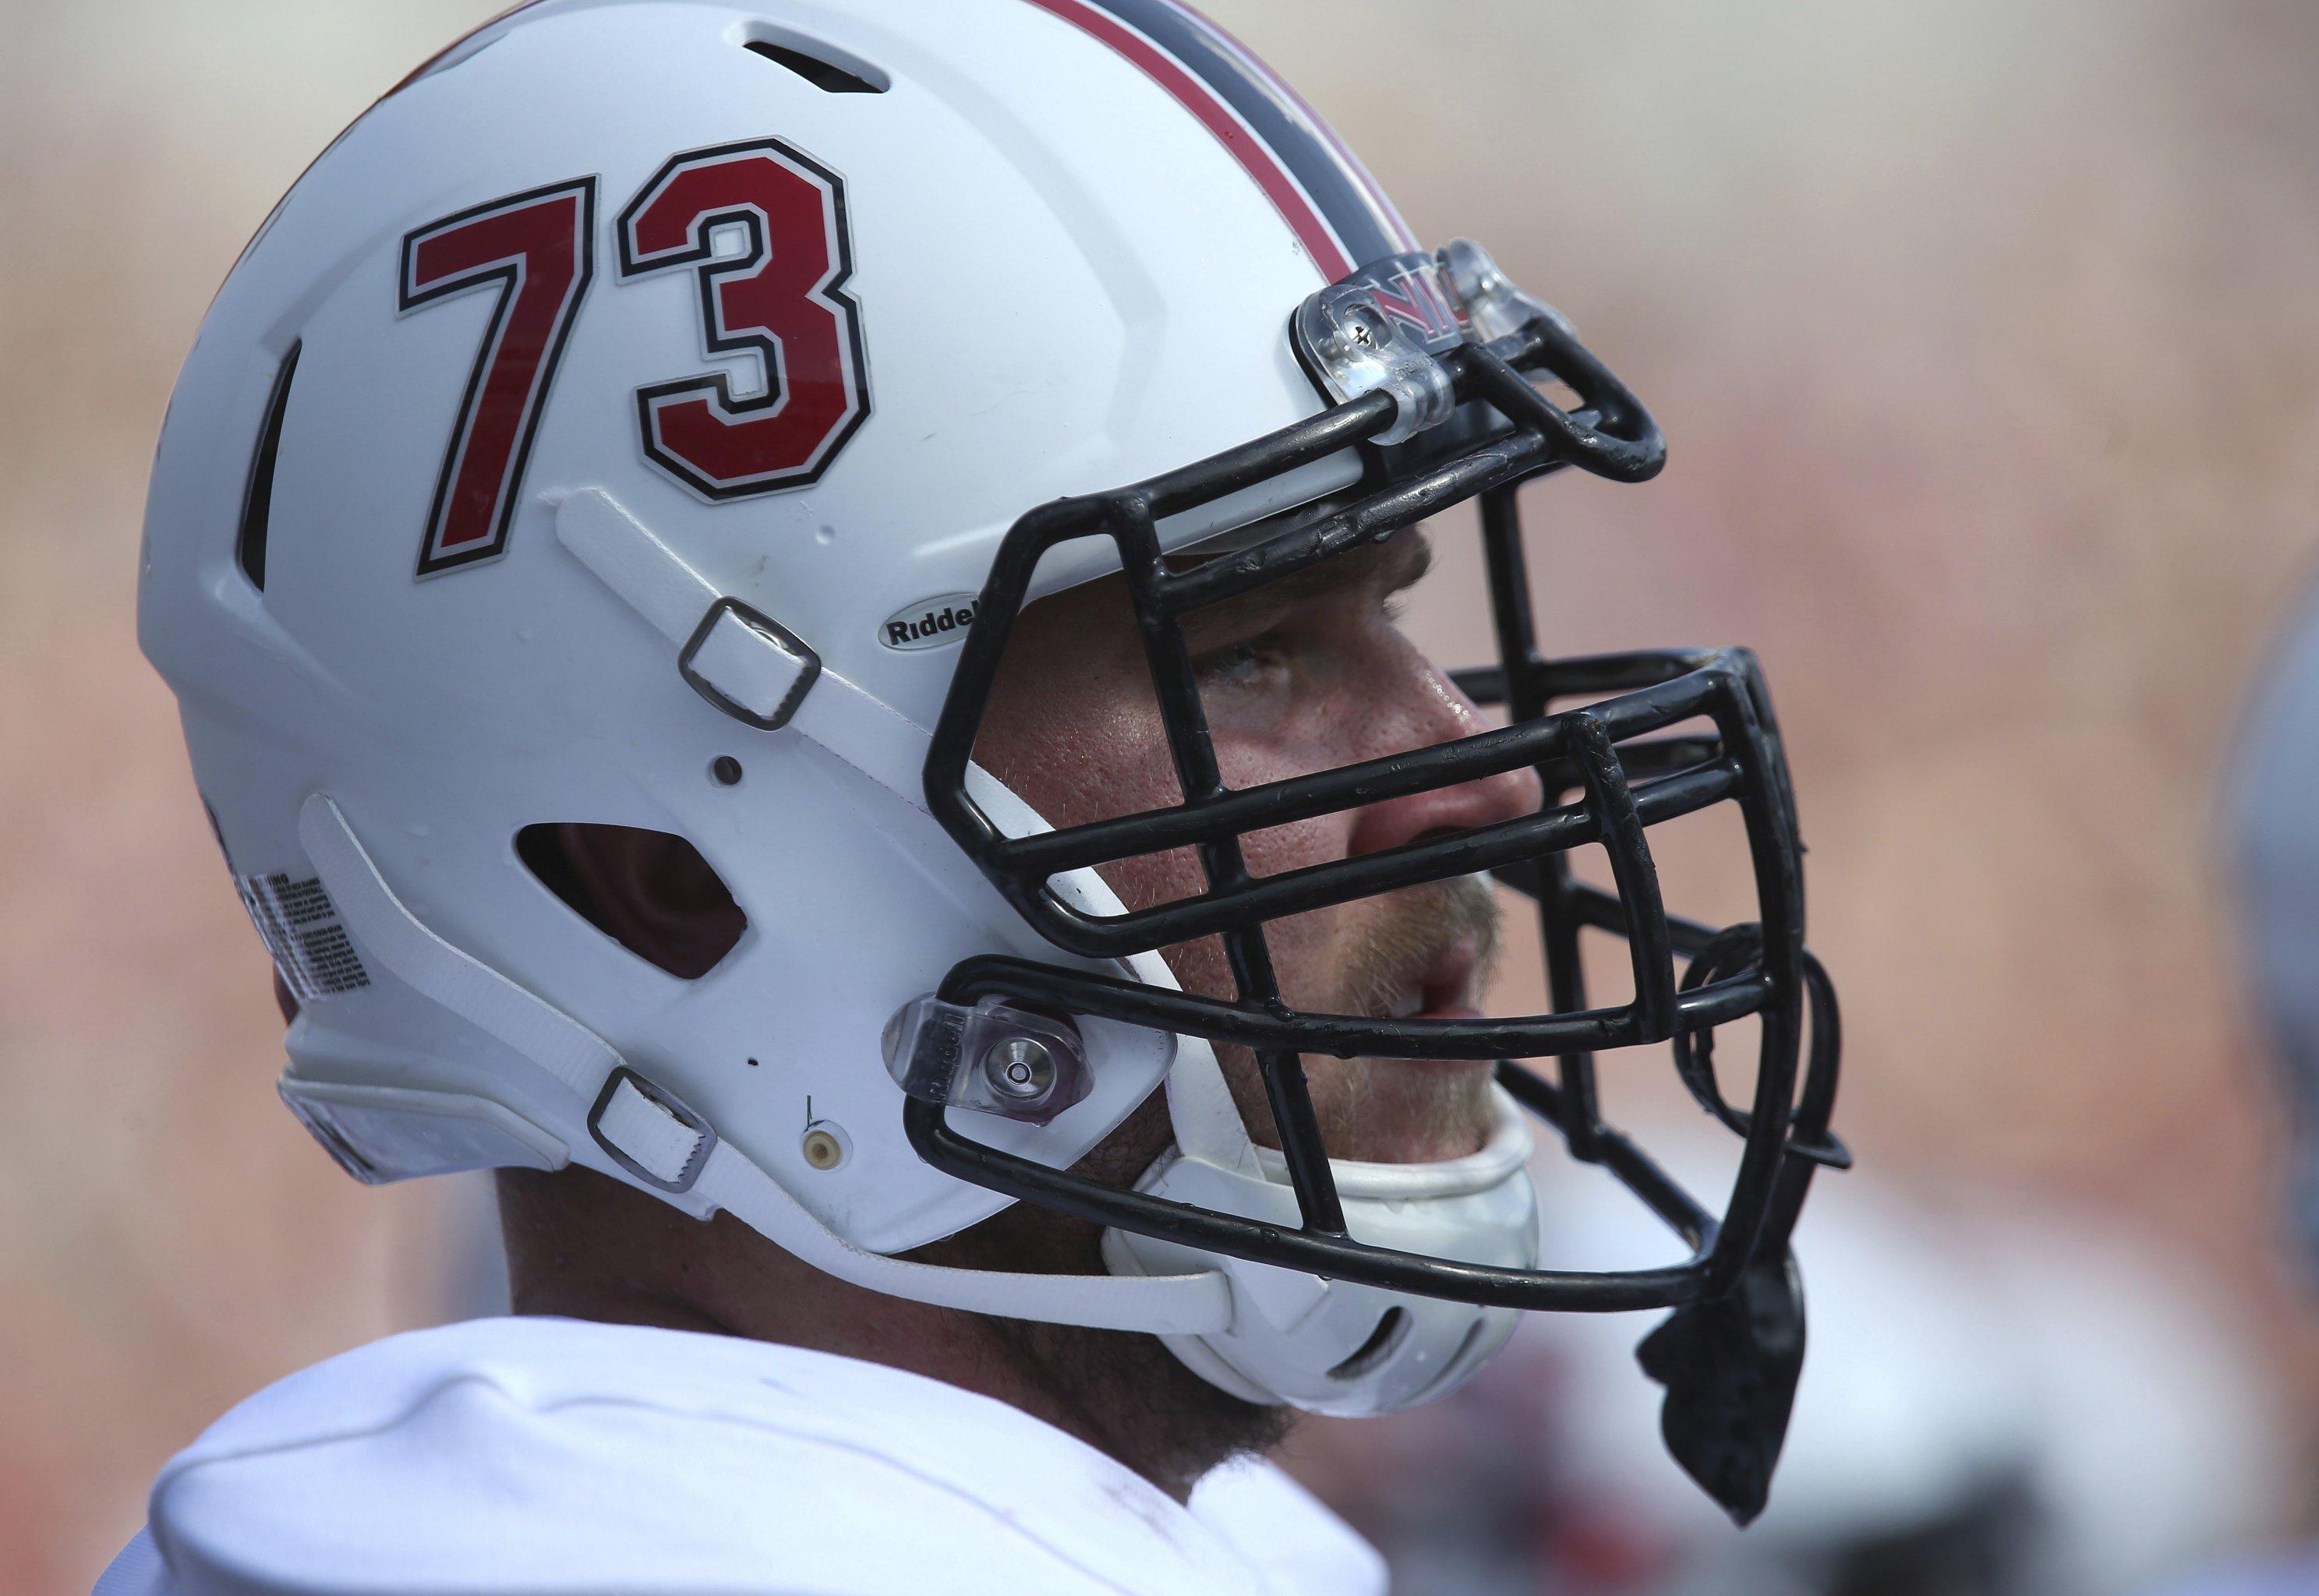 NFL Draft 2019: Round 2-3 Grades for Every Pick | Bleacher